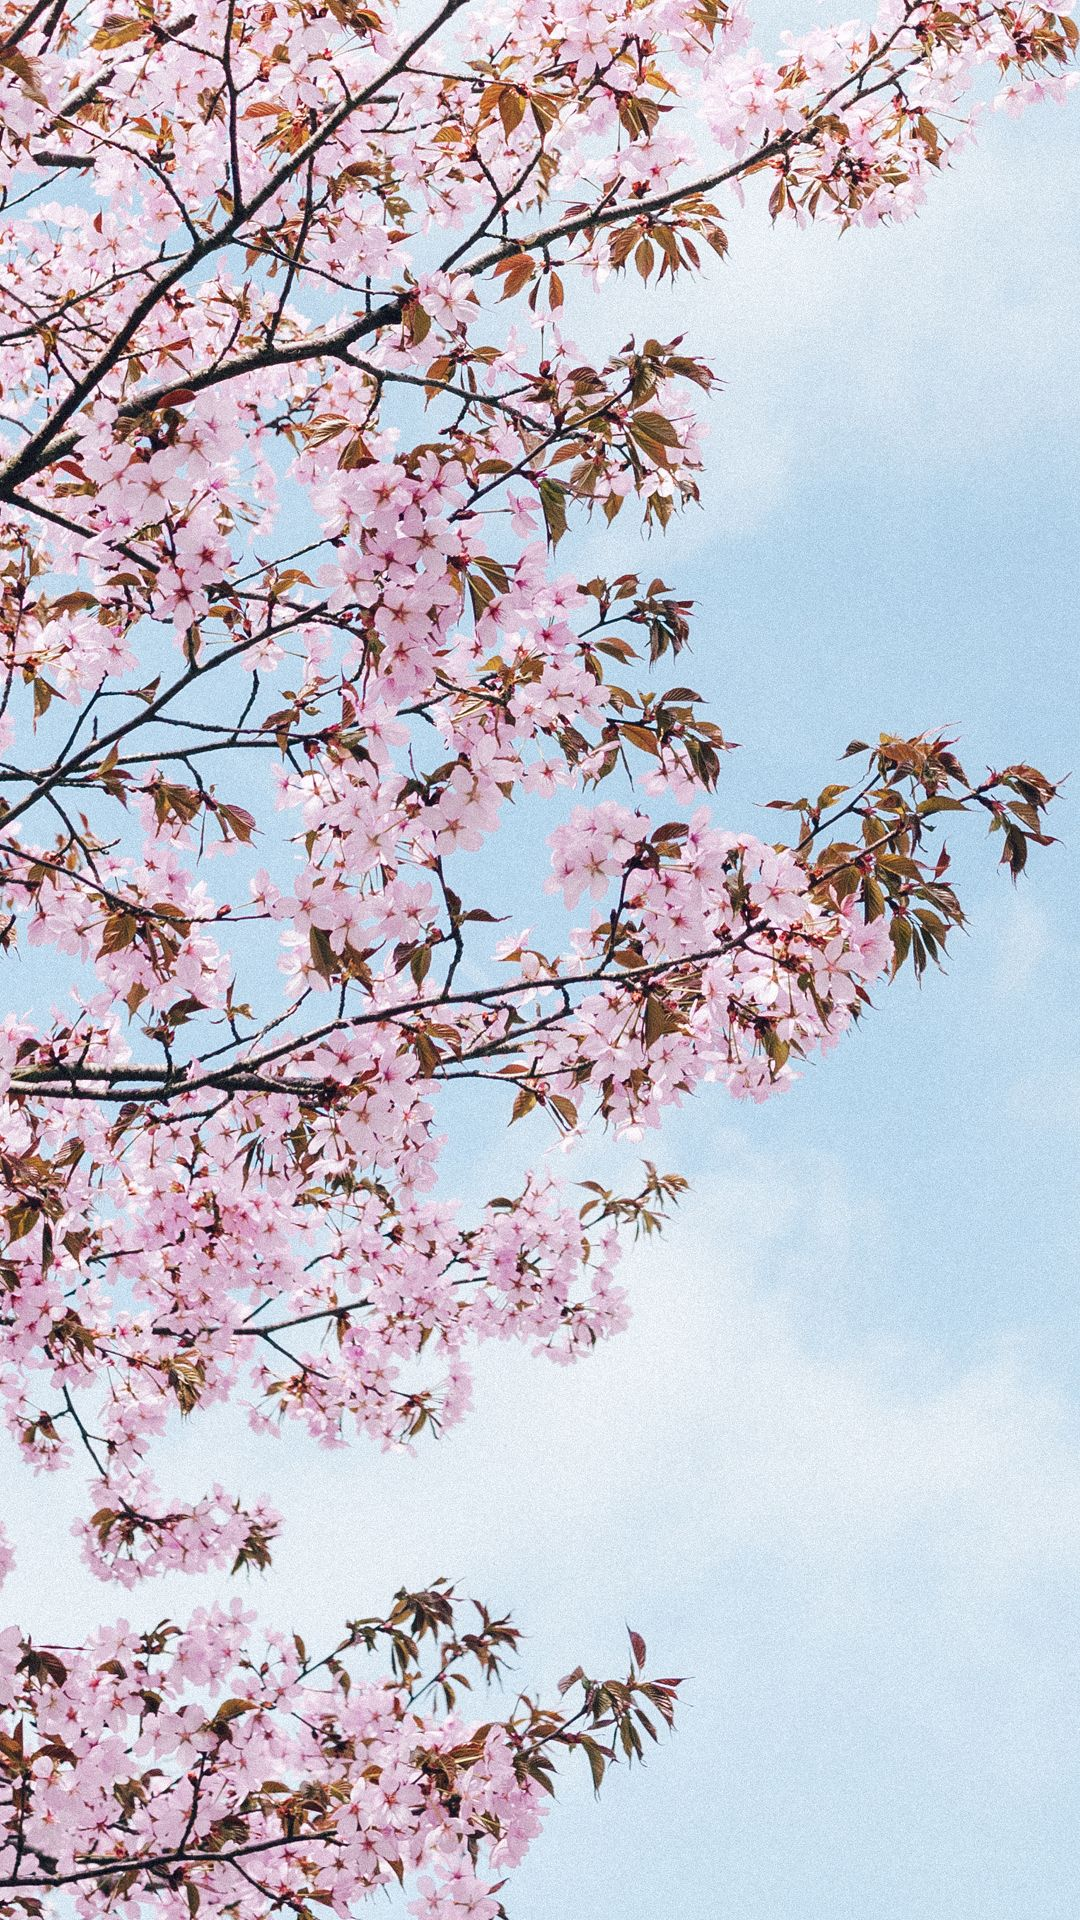 A Cherry Blossom Wallpaper You Can Use To Brighten Up Your Phone Achtergronden Afbeeldingen Boom Behangpapier